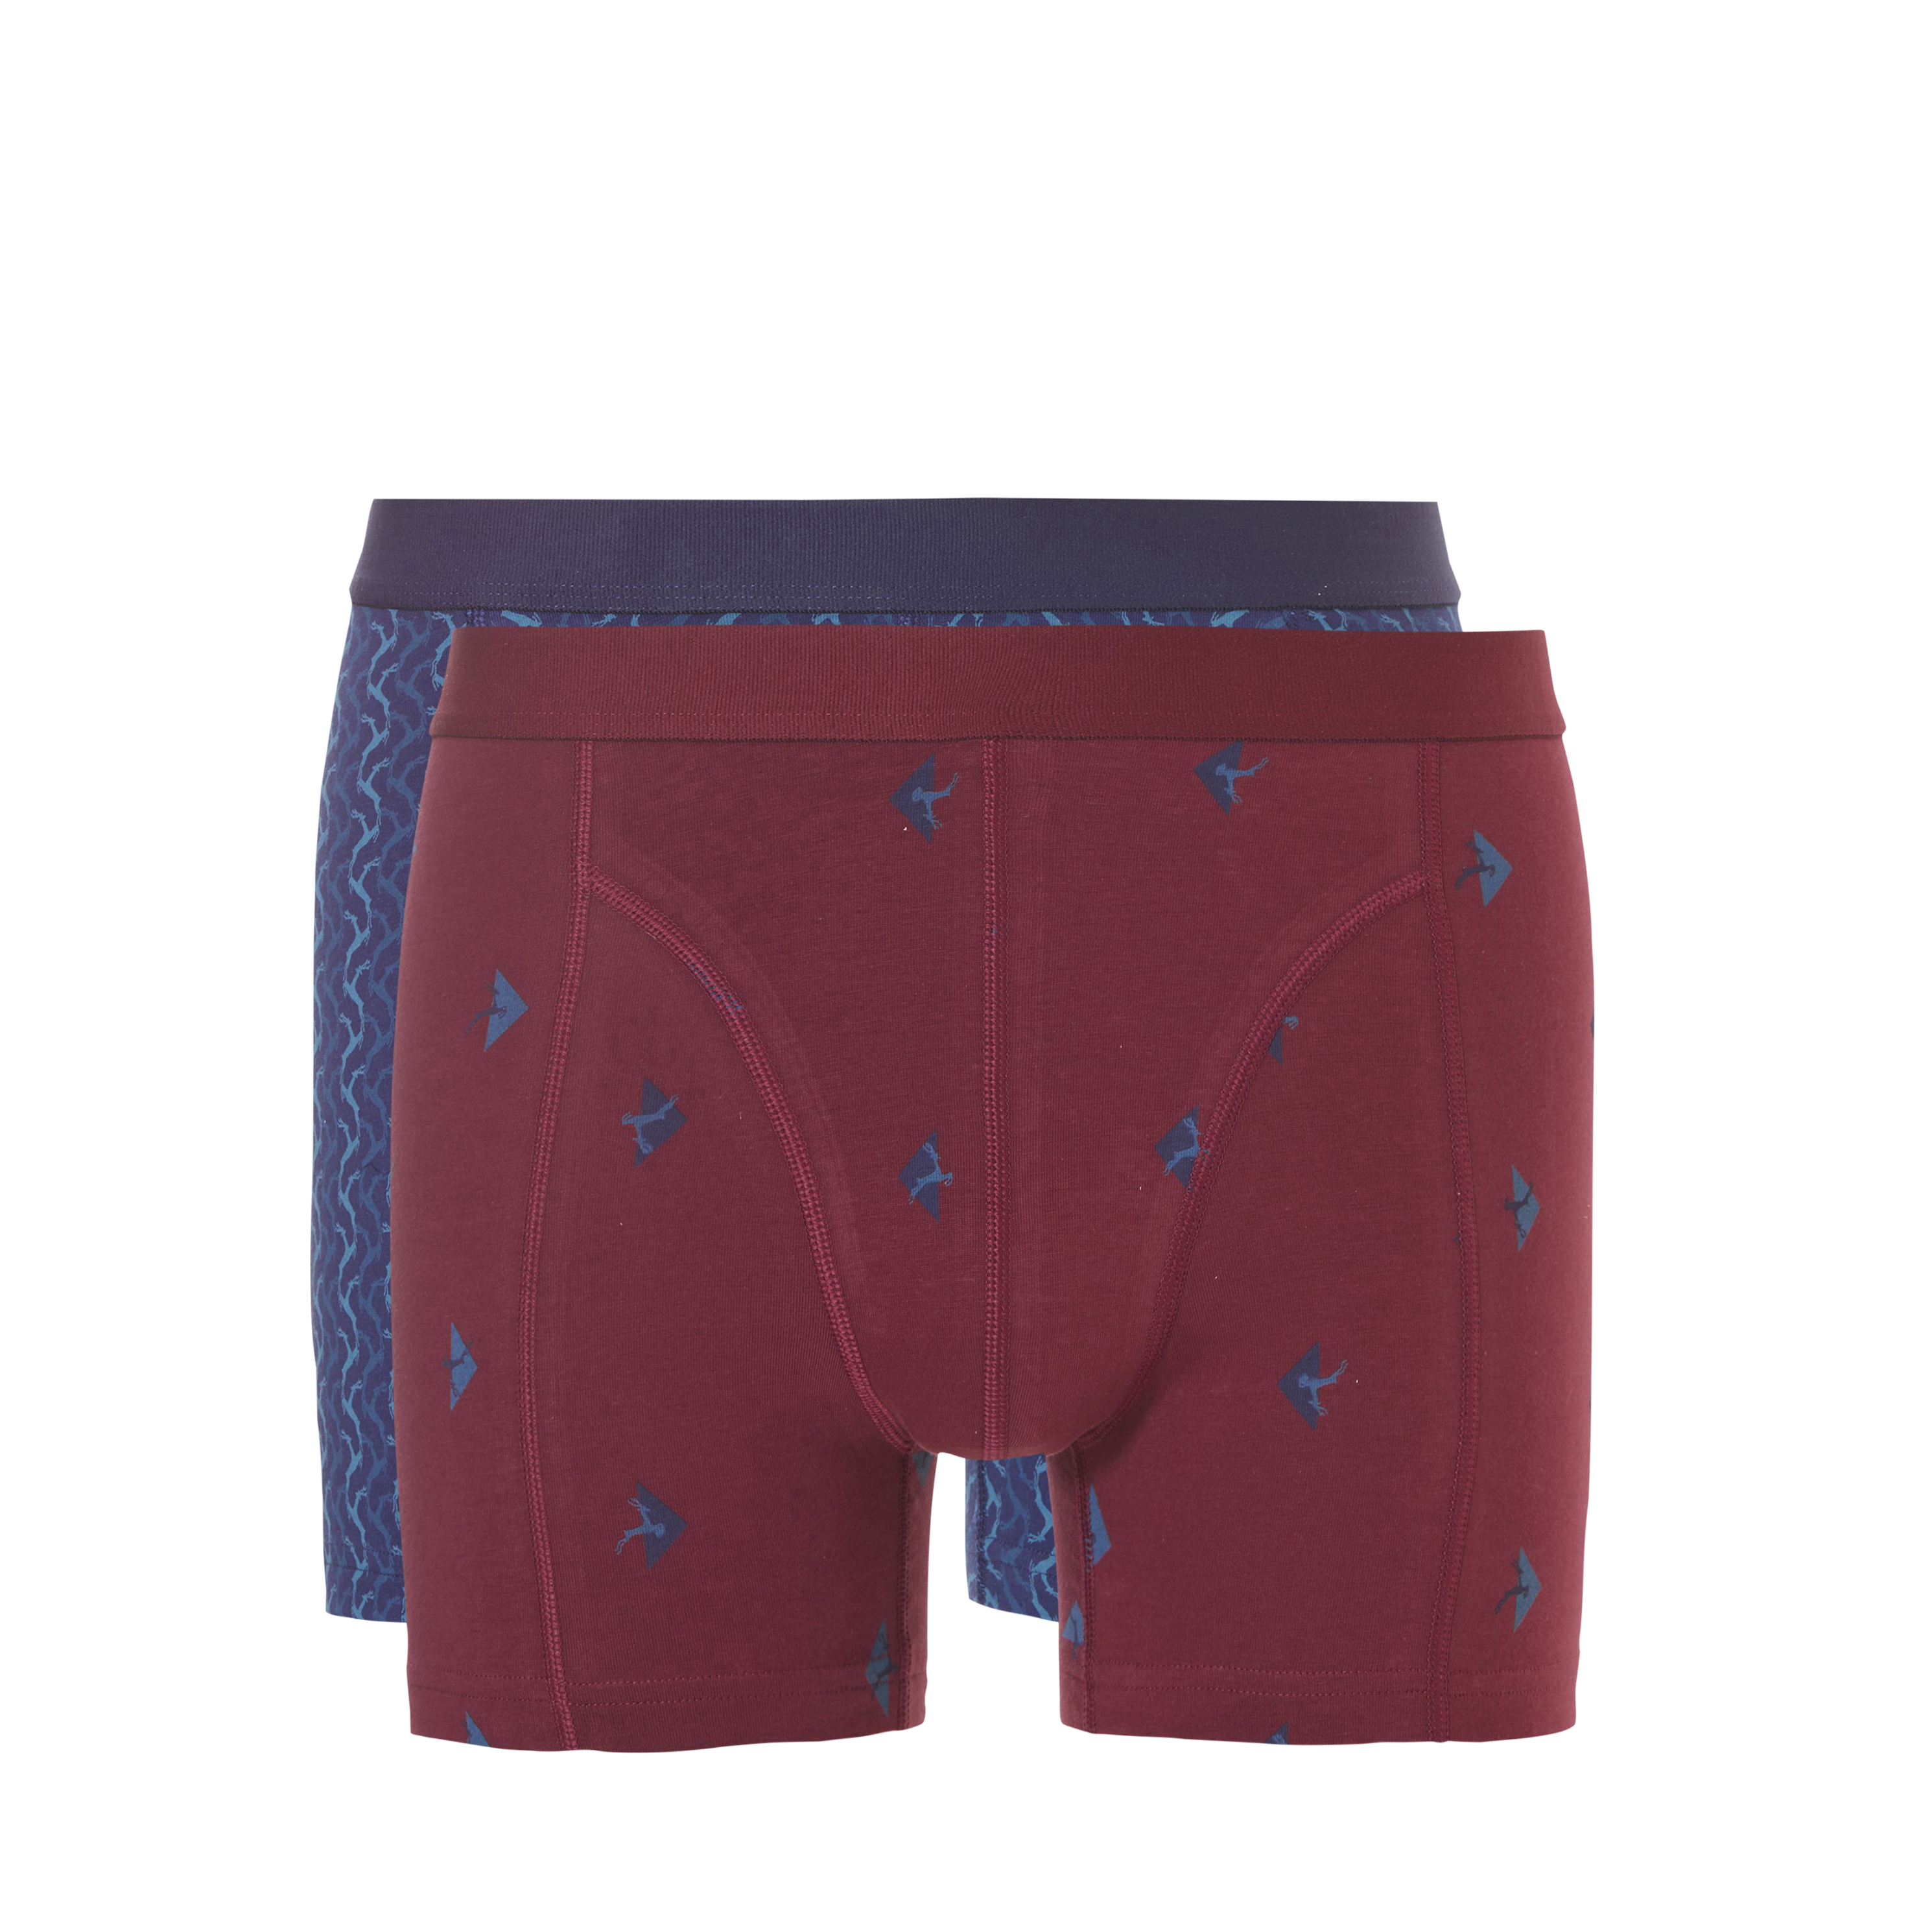 Ten Cate men fine shorts 2-Pack burgundy deer + navy deer